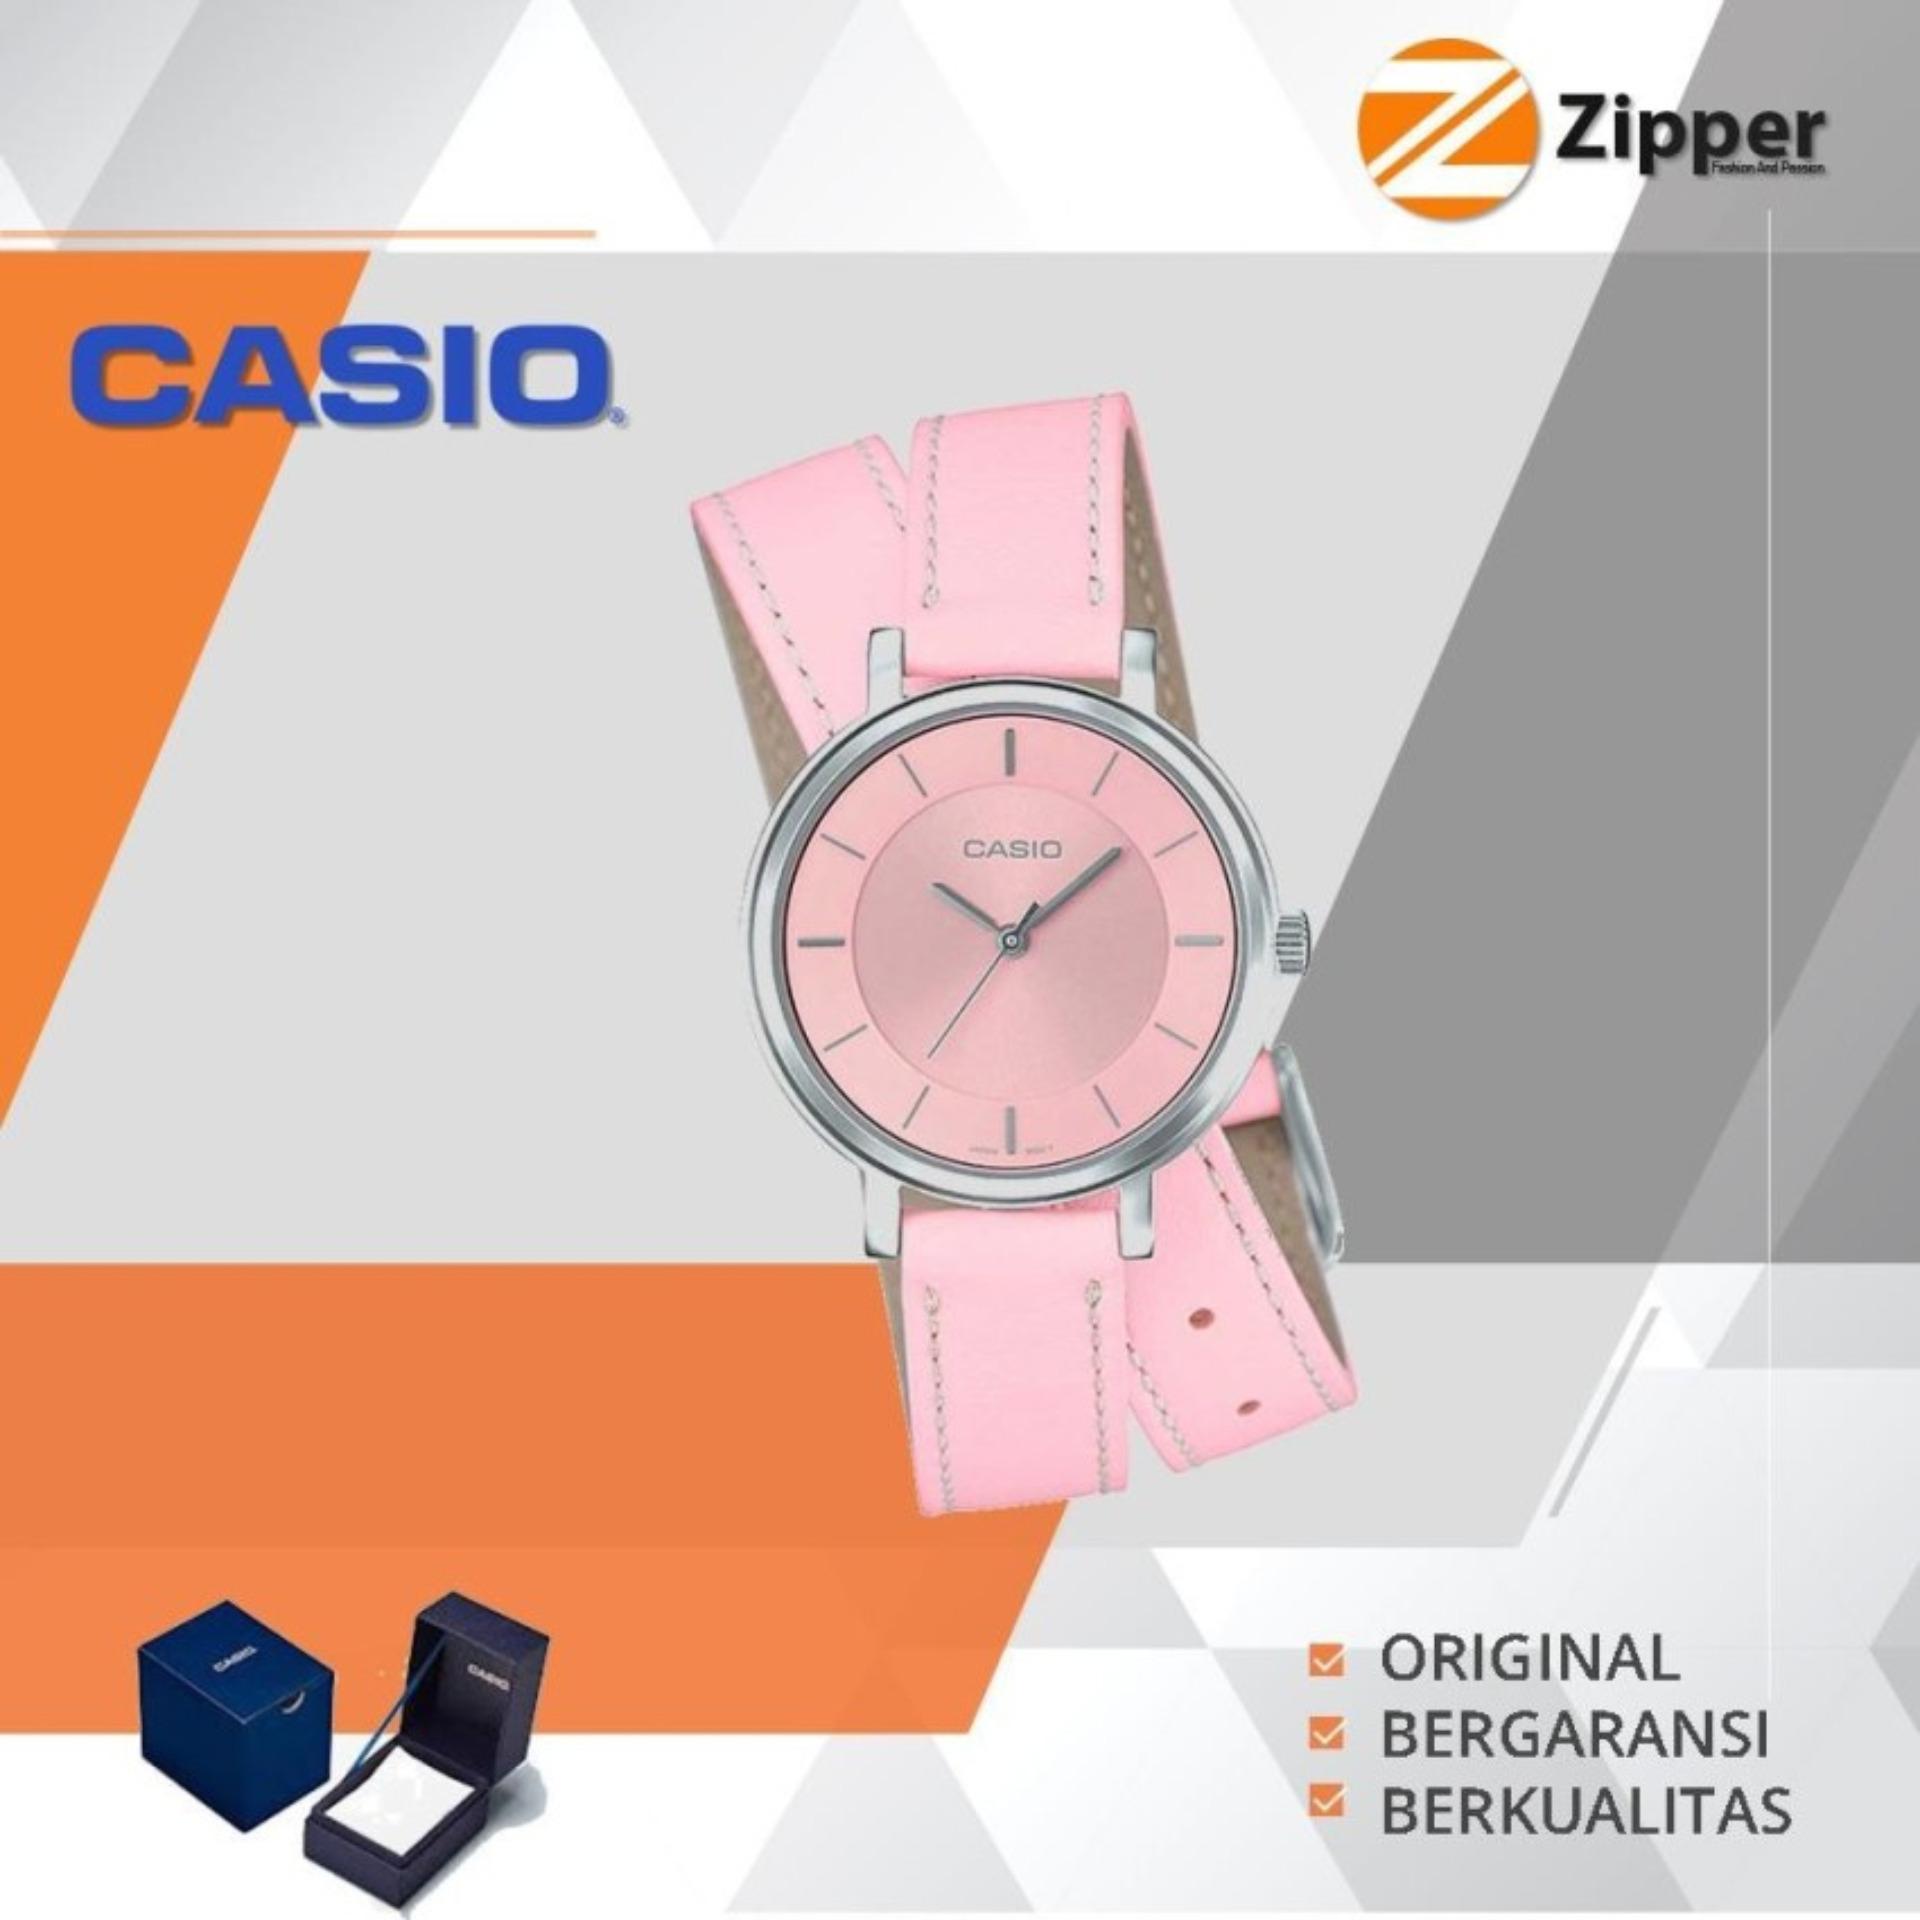 Casio Analog Jam Tangan Wanita Tali Kulit Loop LTP-E143DBL Series